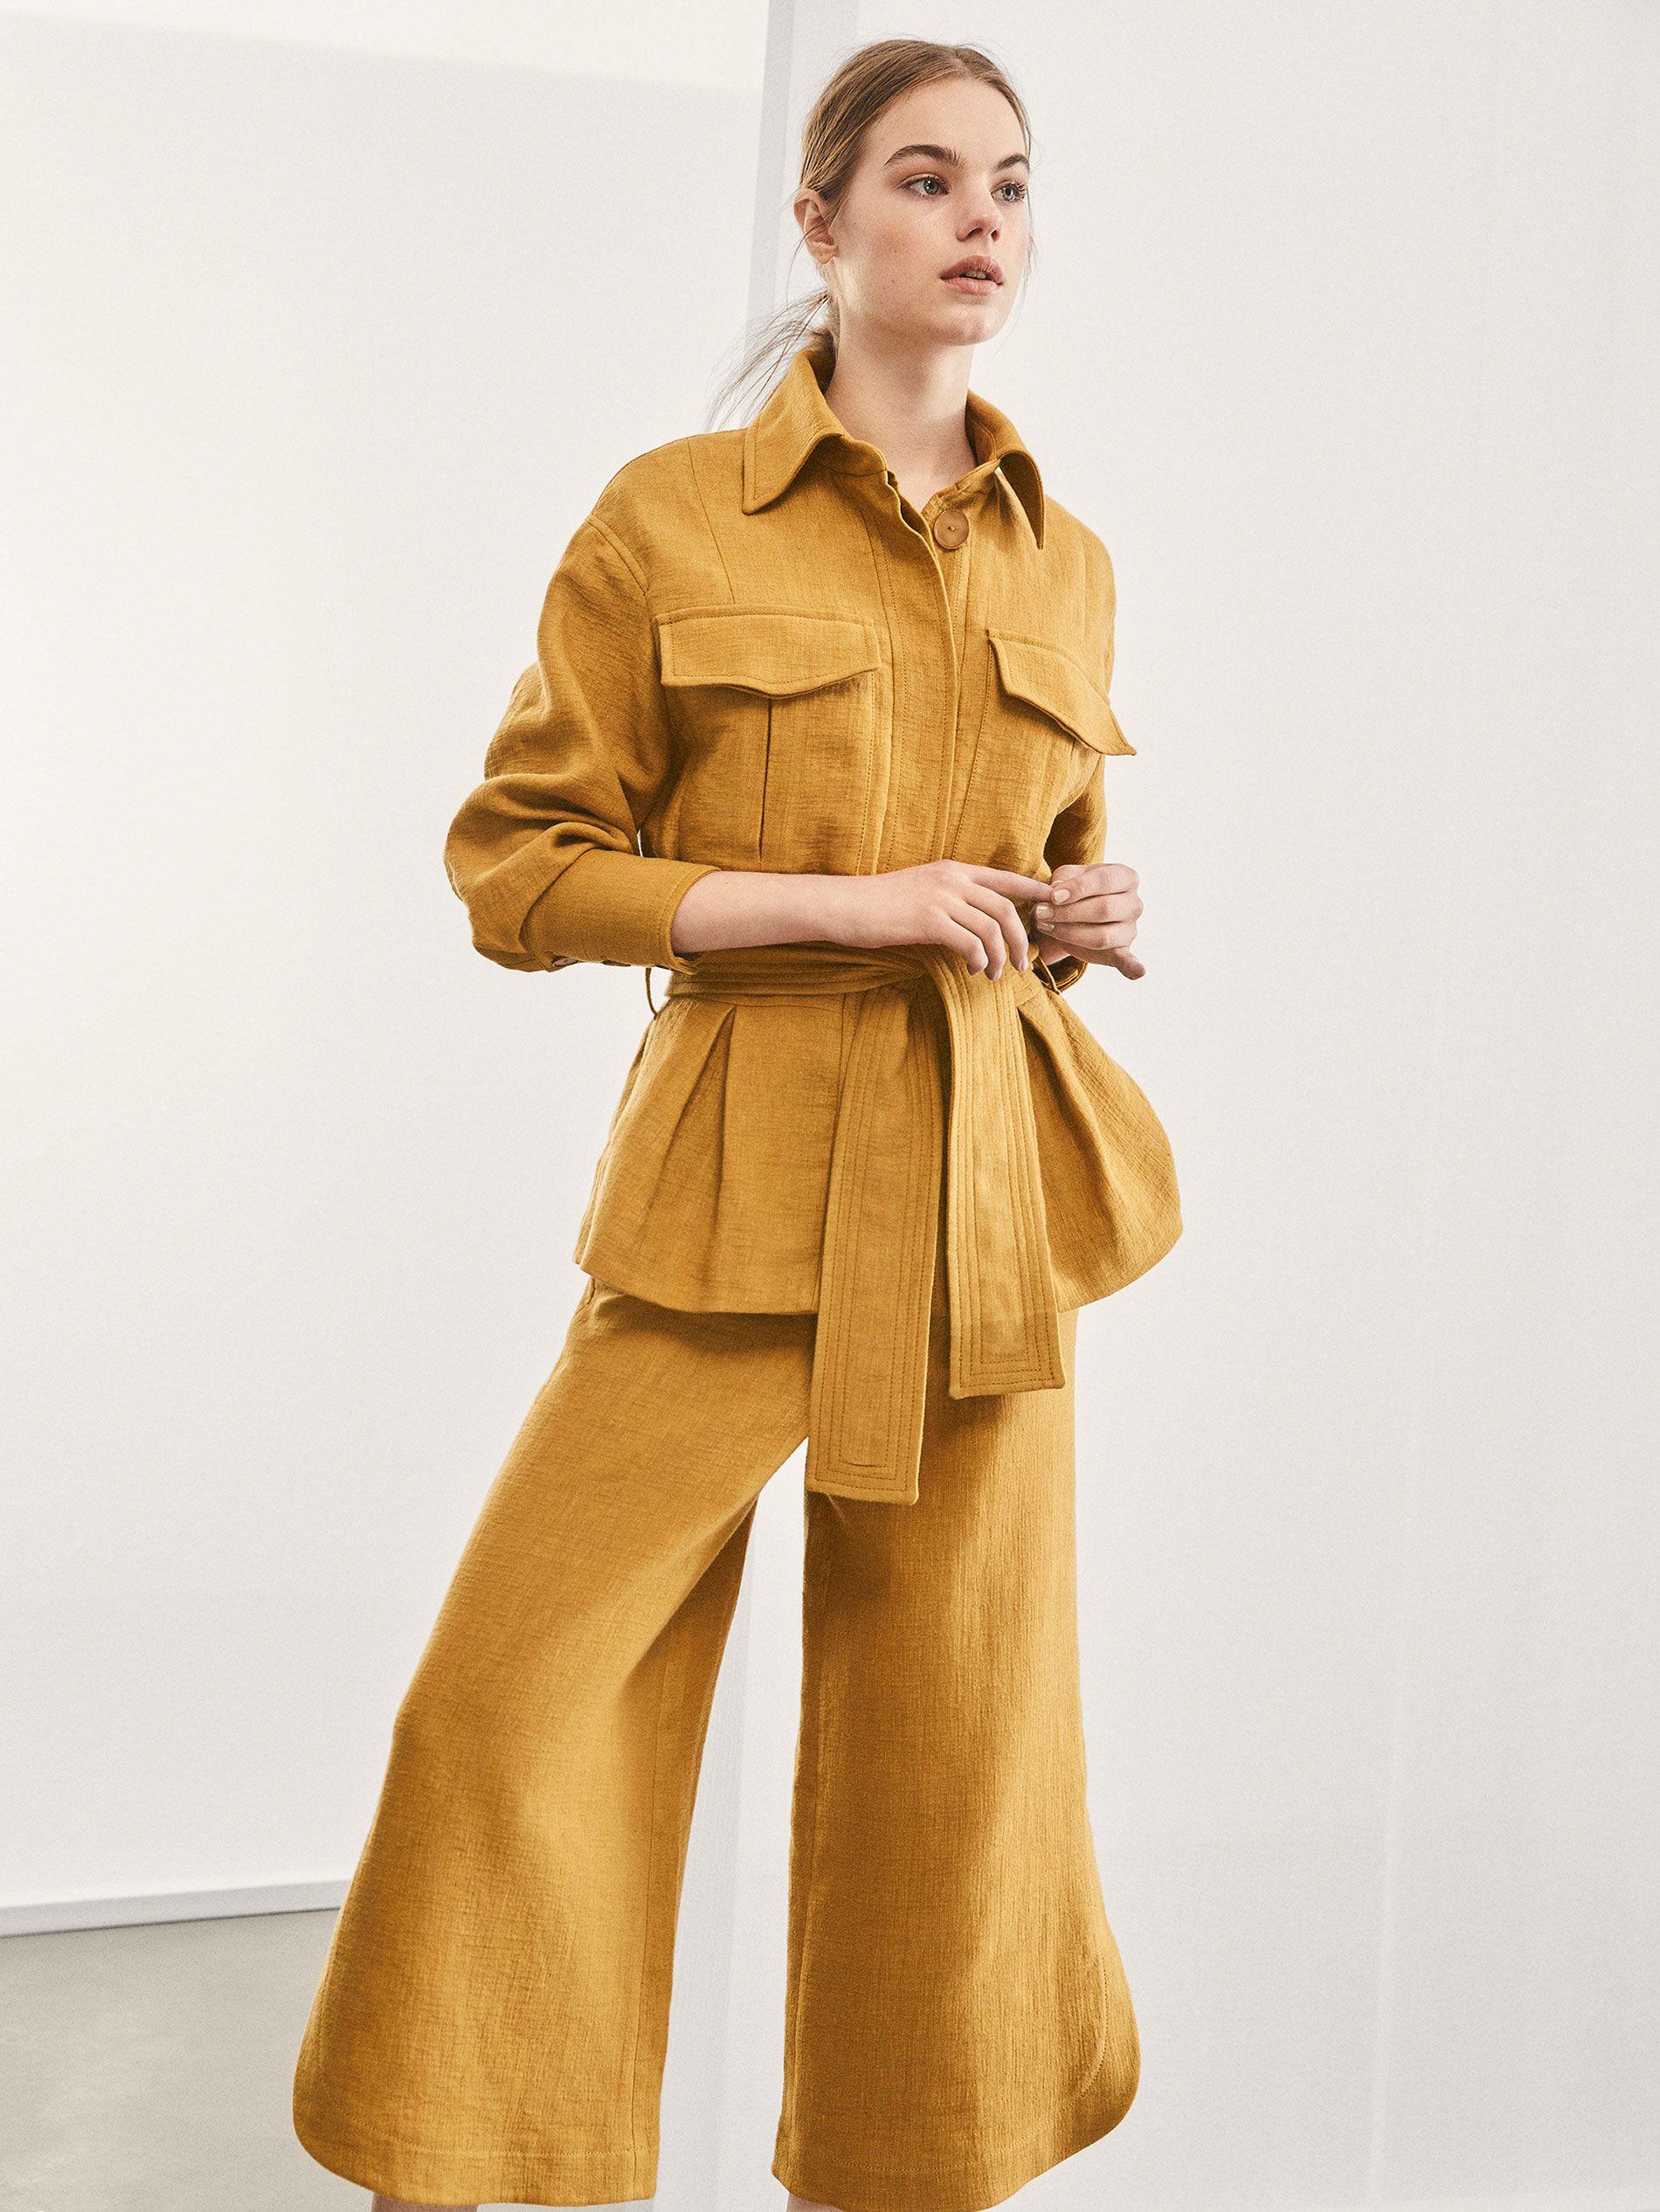 Fall Winter 2017 Women S Limited Edition Linen Safari Jacket At Massimo Dutti Safari Jacket Street Style Denim Fashion Safari Jacket